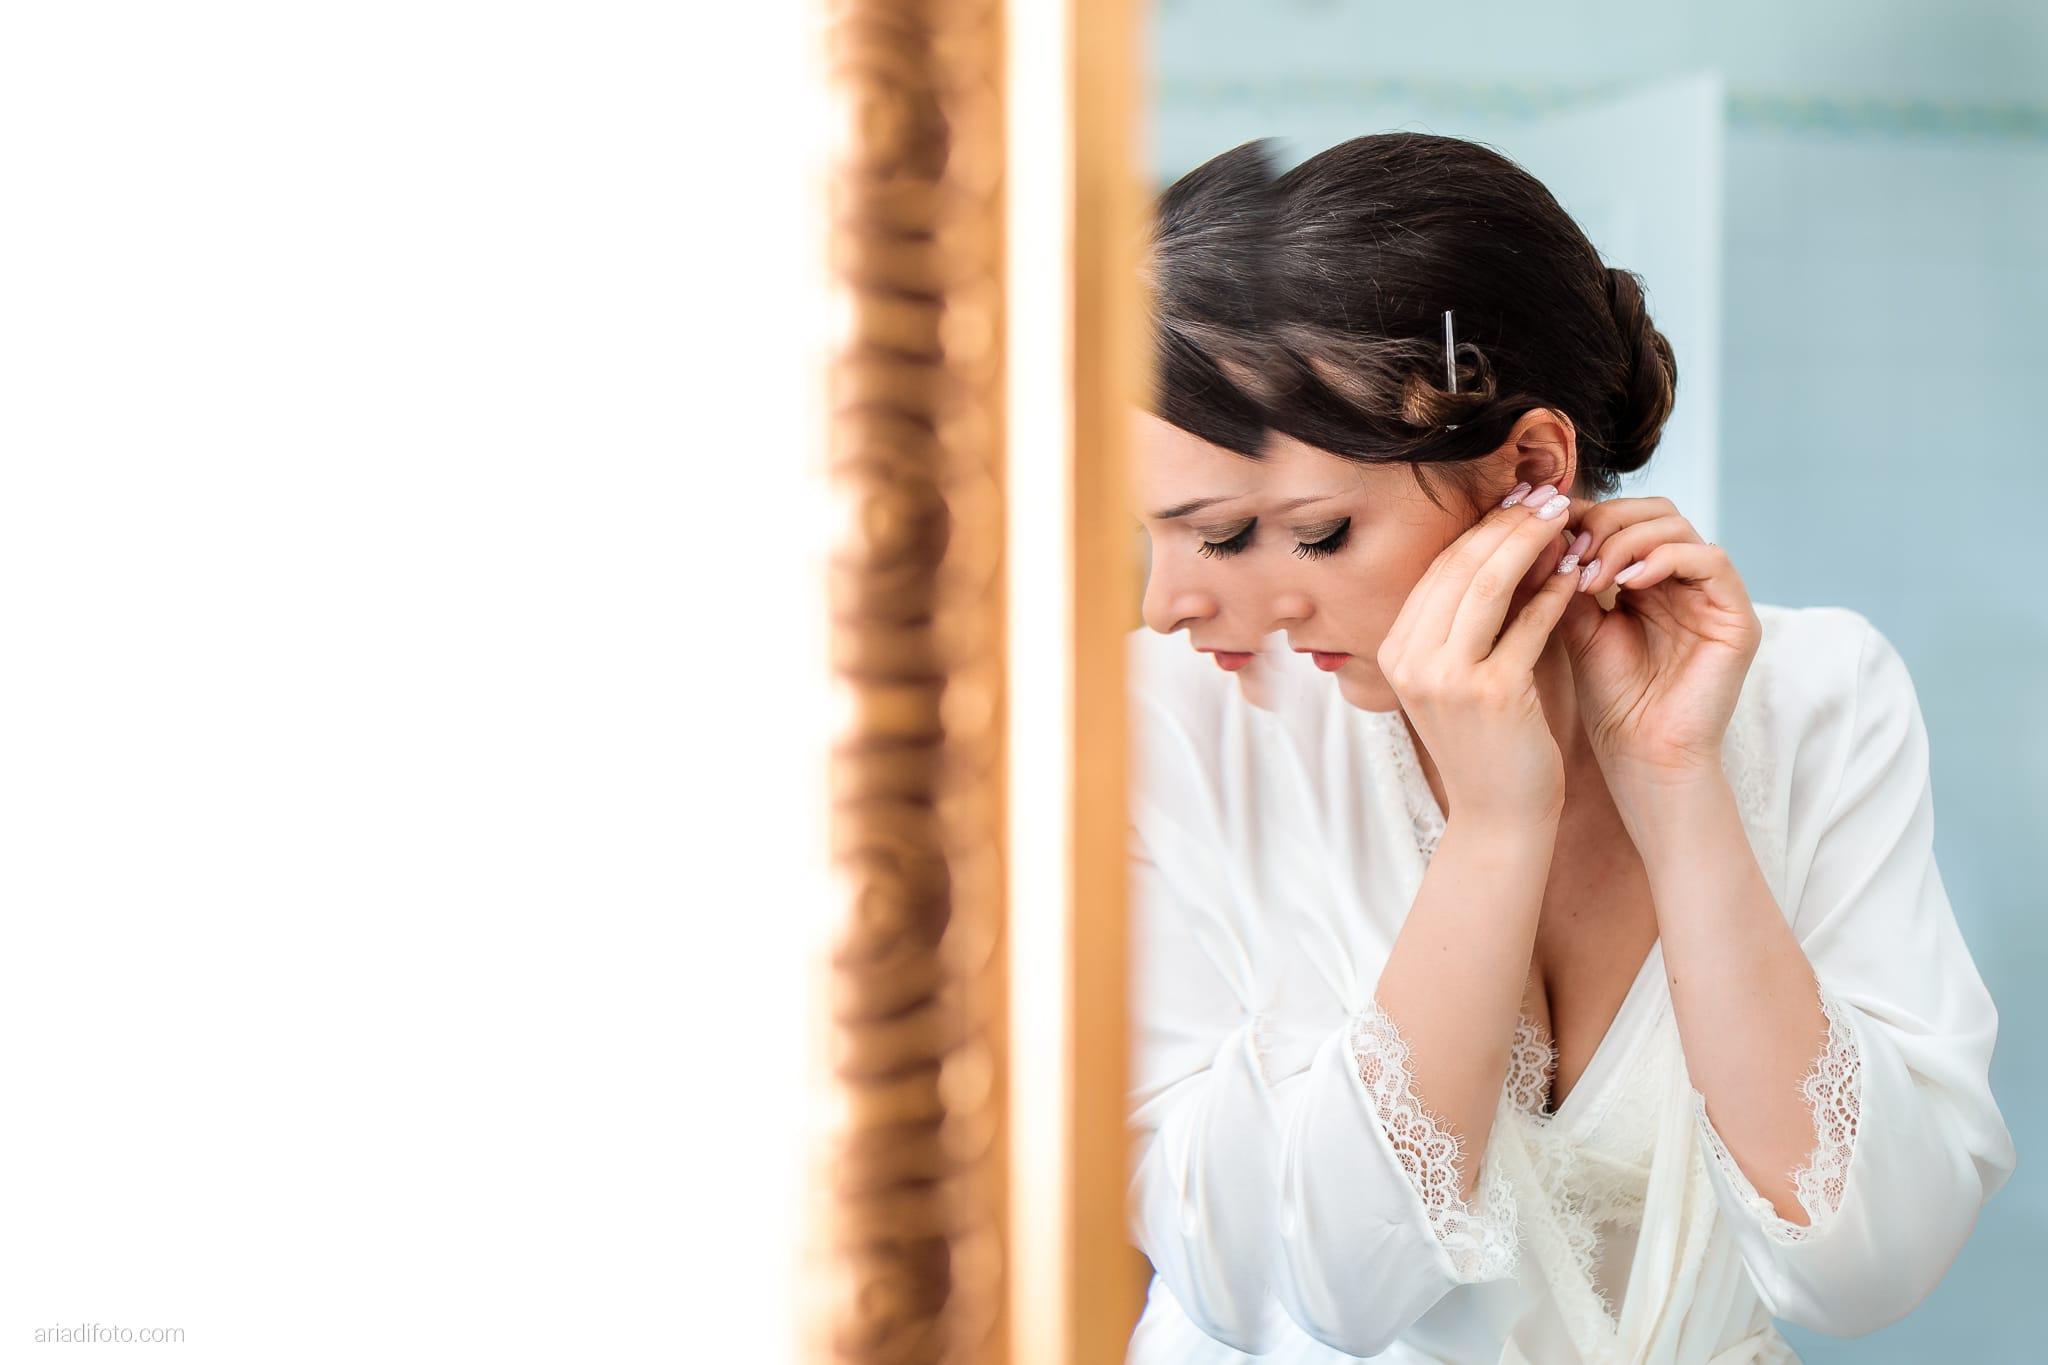 Valentina Marco Matrimonio Duomo Gorizia Castelvecchio Sagrado preparativi riflesso specchio